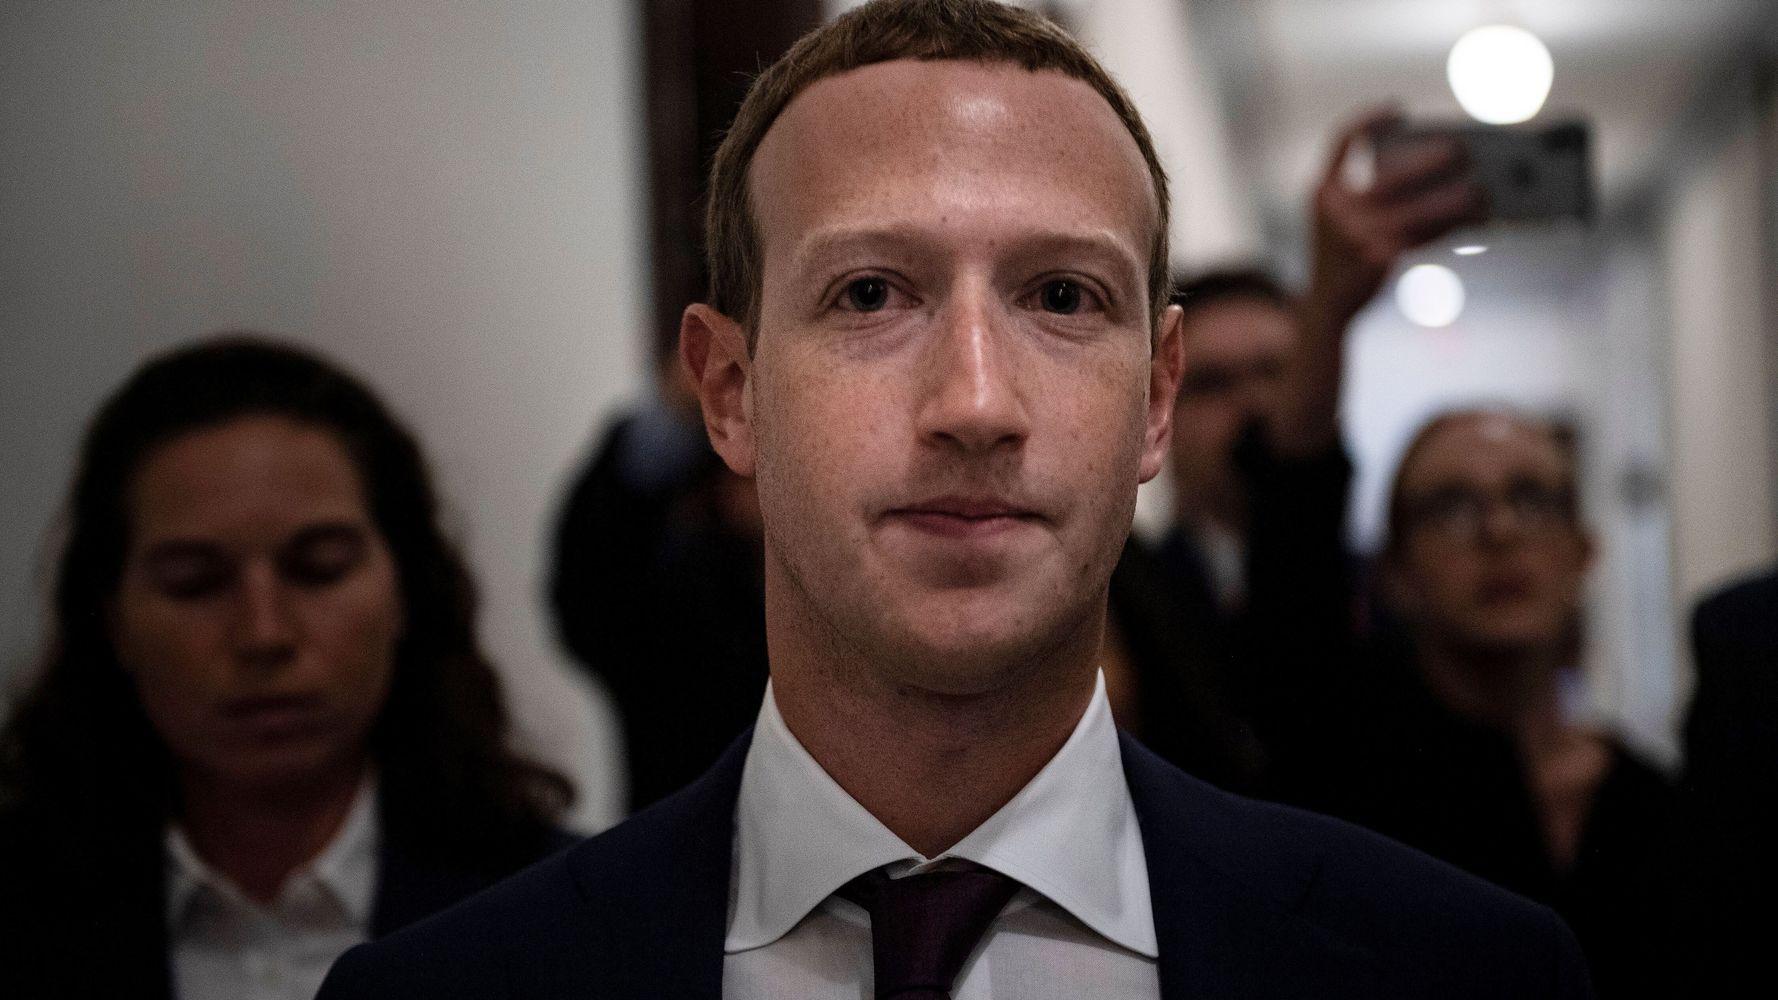 Westlake Legal Group 5d93544f21000031005110c1 Mark Zuckerberg Says What He Thinks About Elizabeth Warren In Leaked Audio